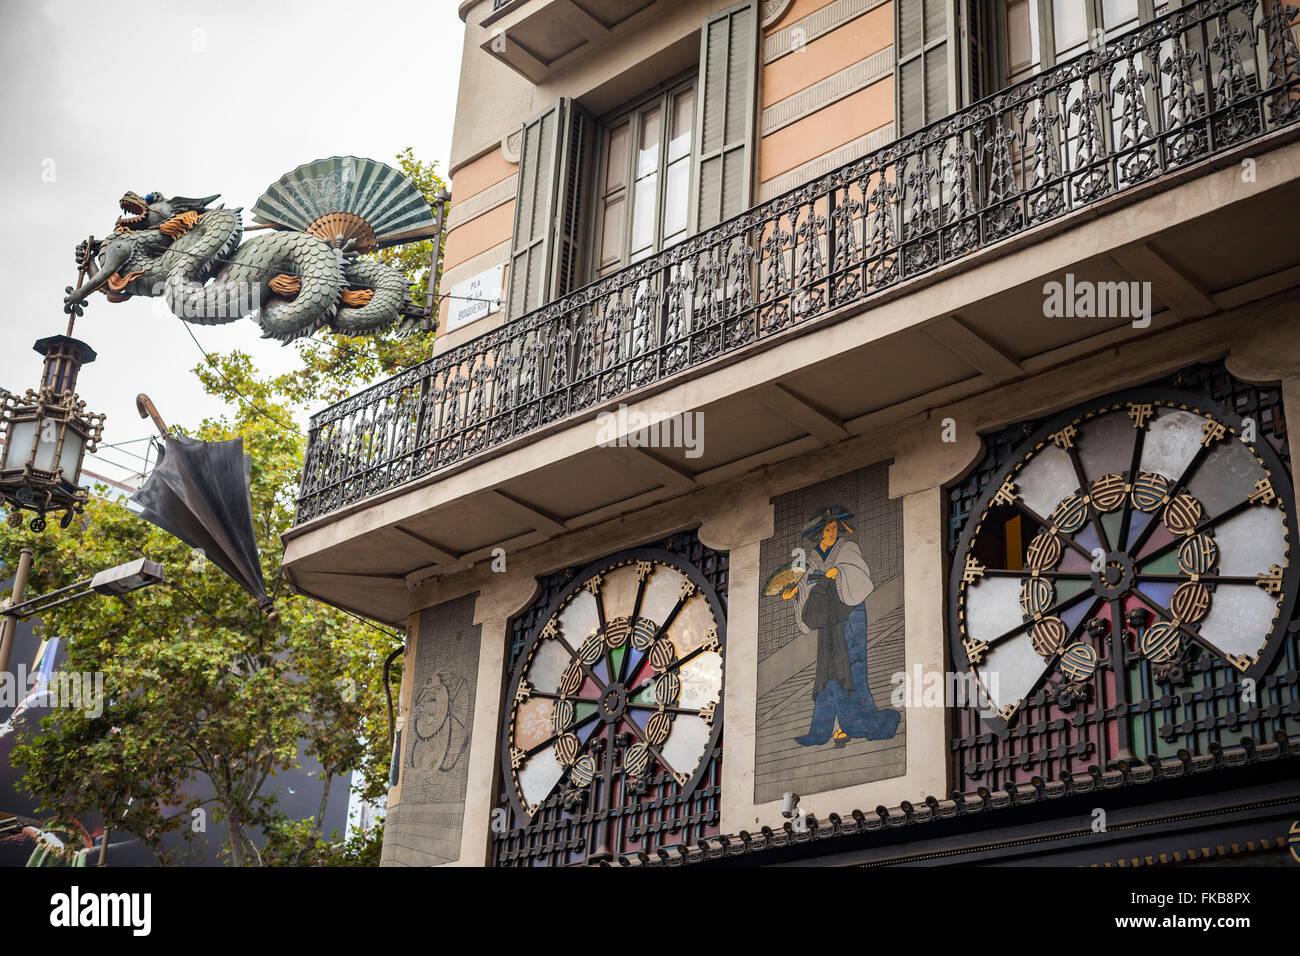 Casa Bruno Cuadros, La Rambla. Barcelona. Stockbild